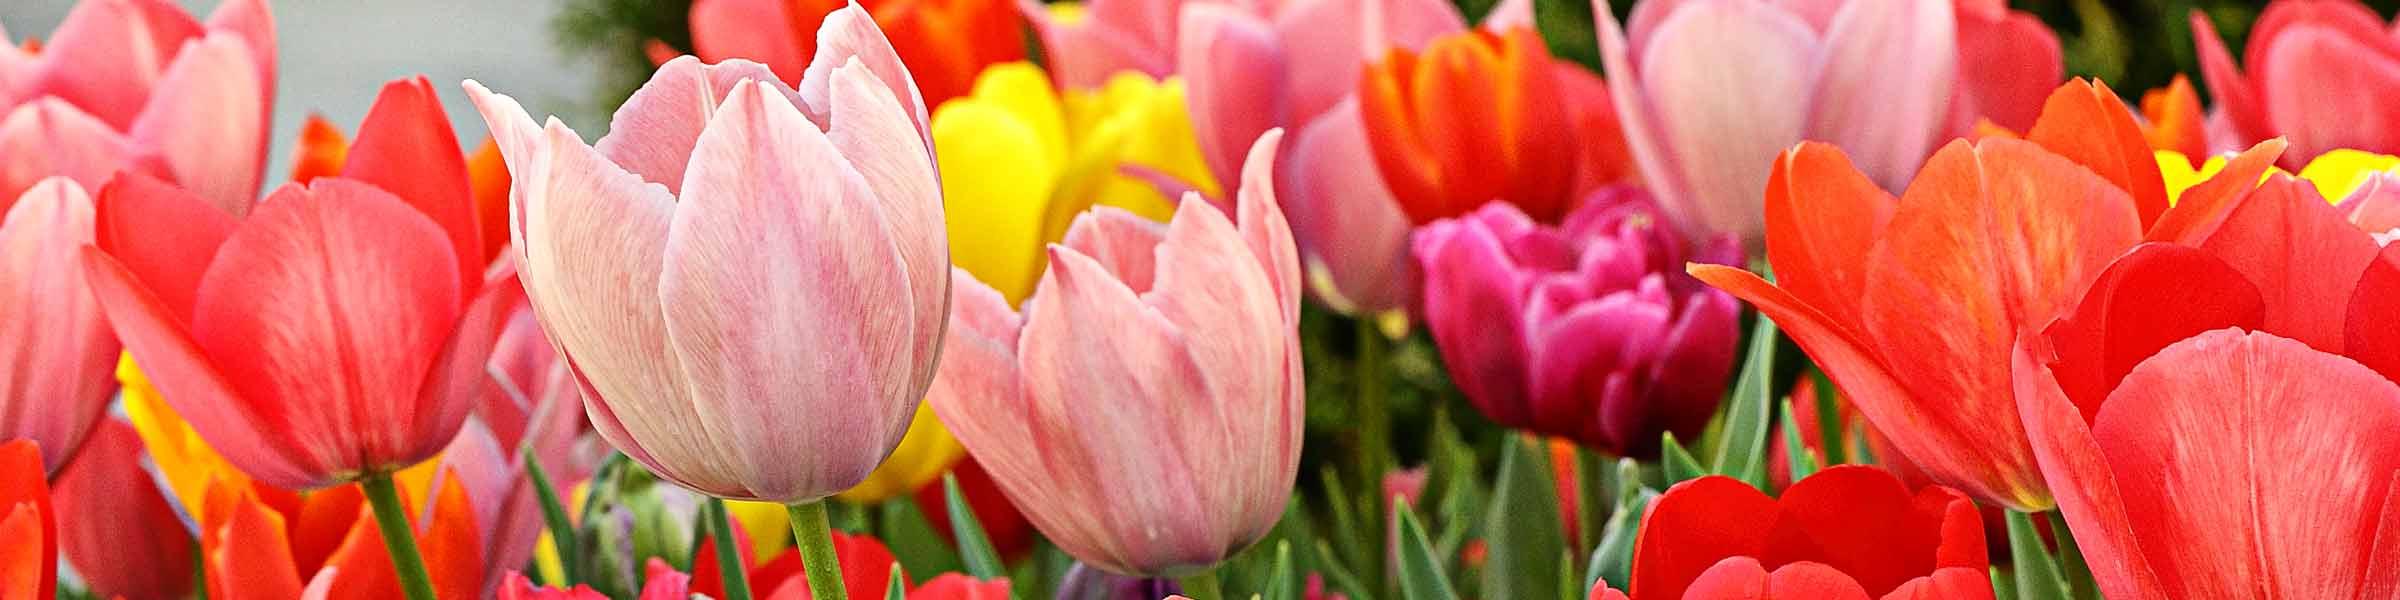 Резултат слика за pregnant for tulips free